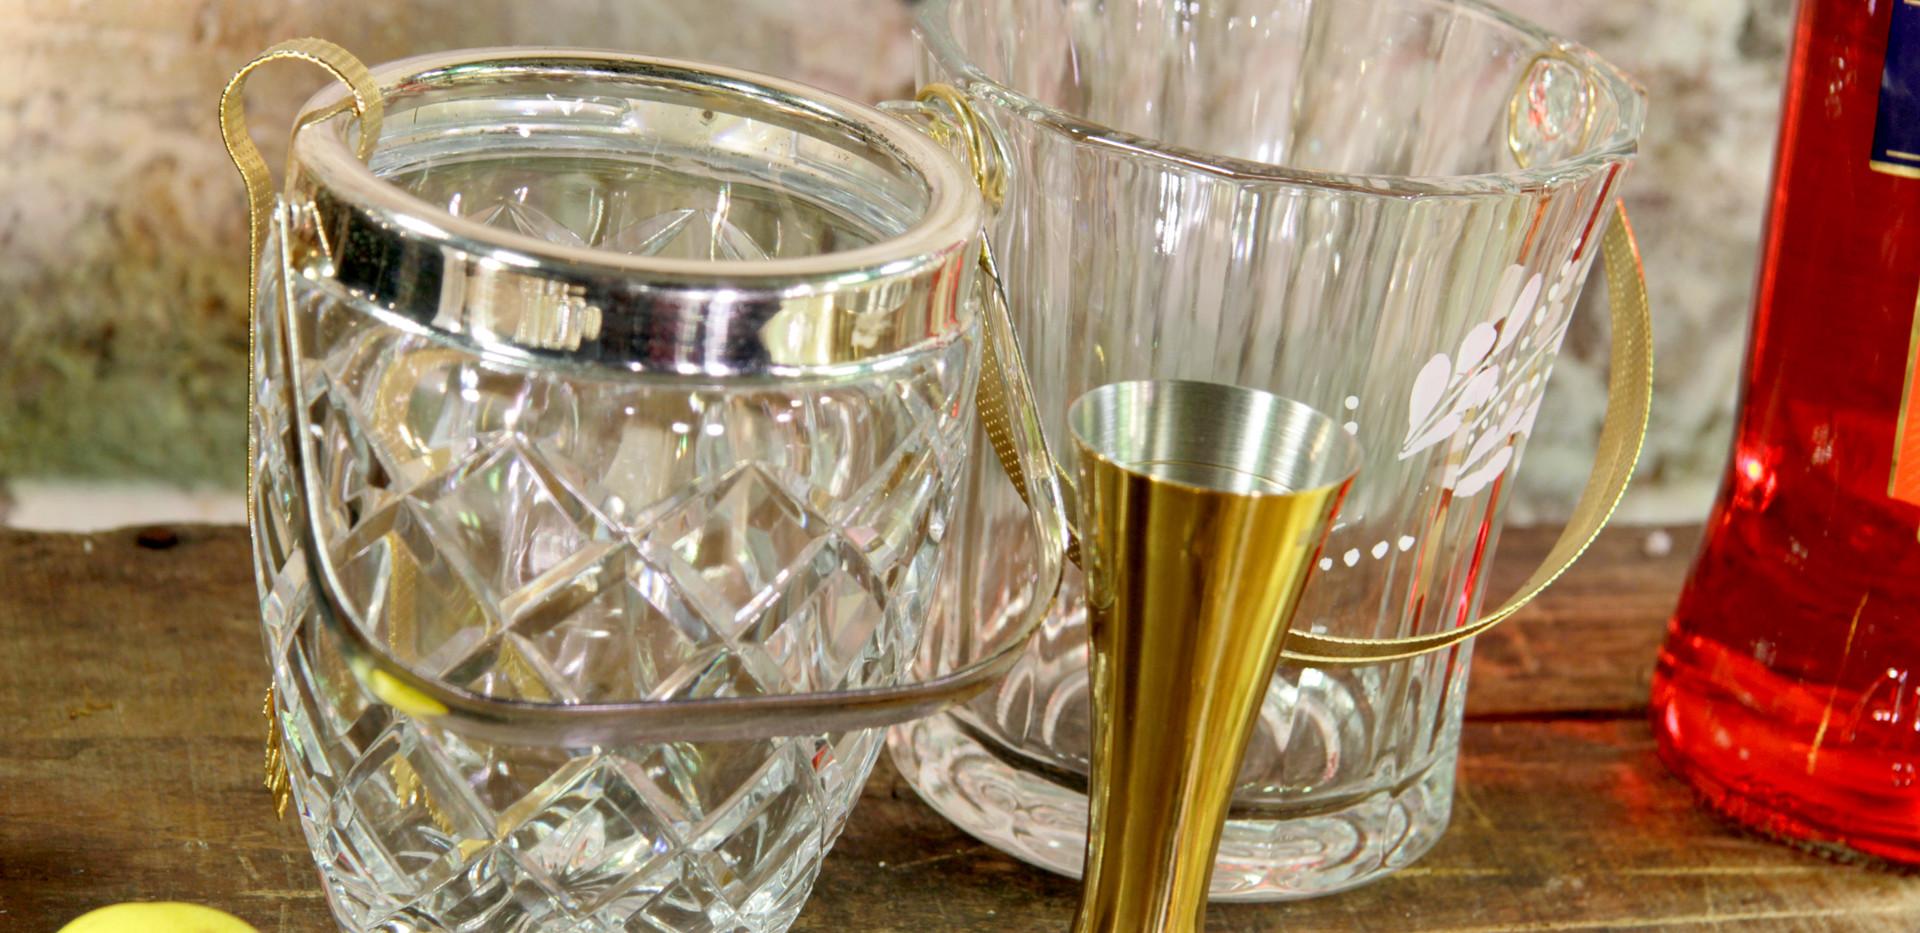 Eiskühler - Je Stk. 4,50 Euro - Barmaß gold - 1,50 Euro